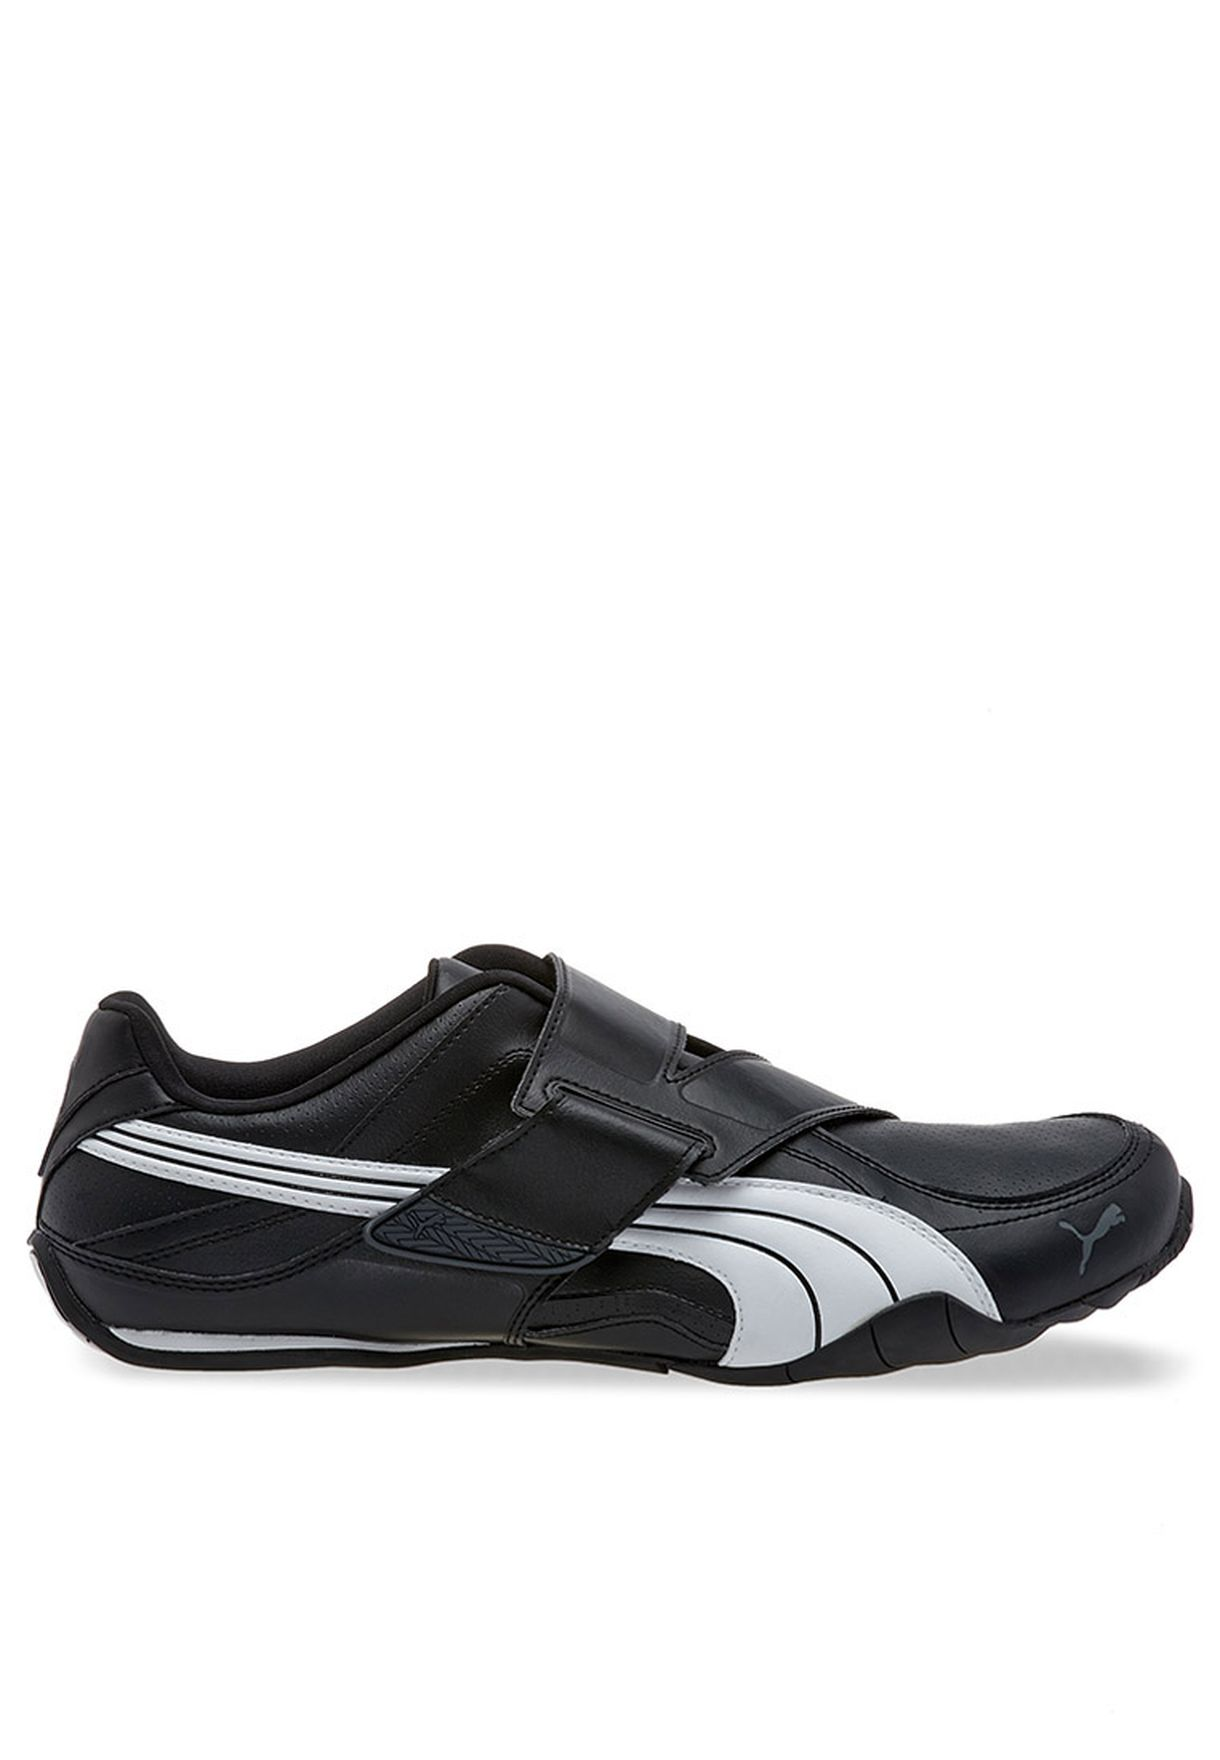 Attaq Running Shoes